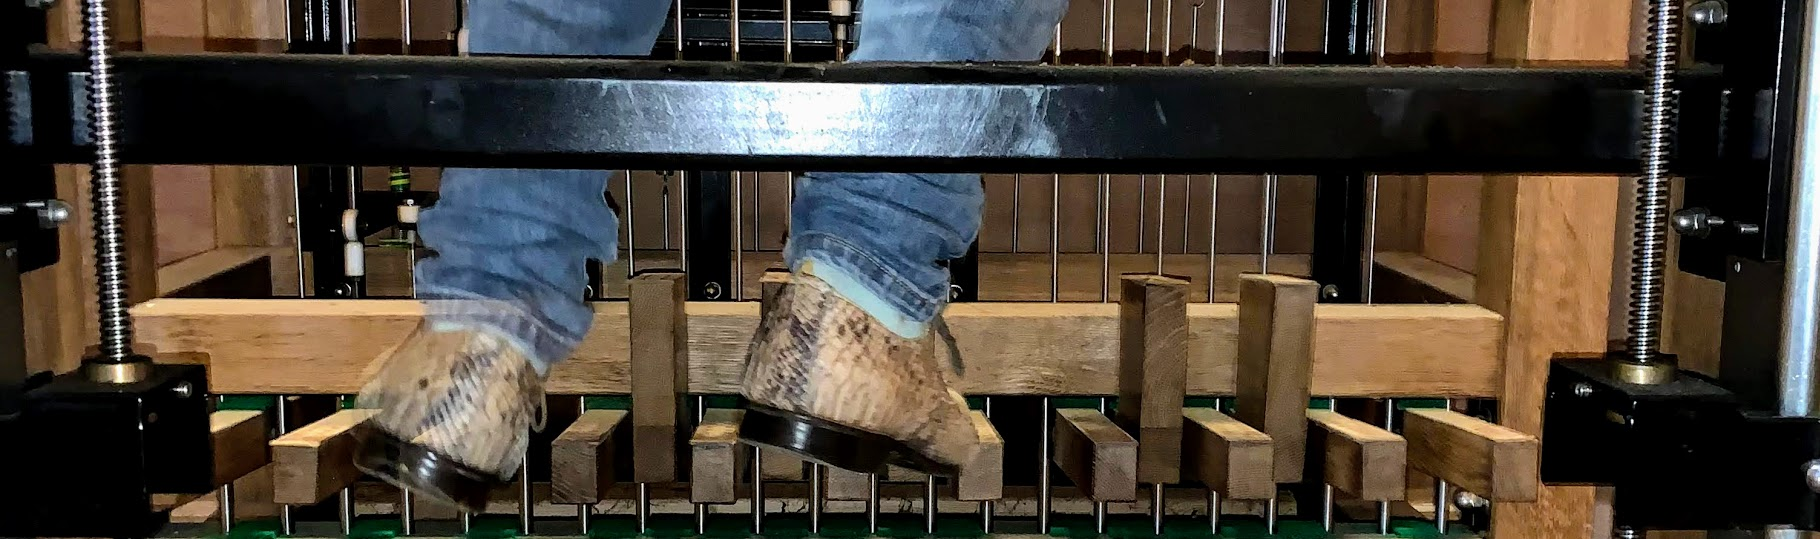 voetpedalen op stokkenklavier